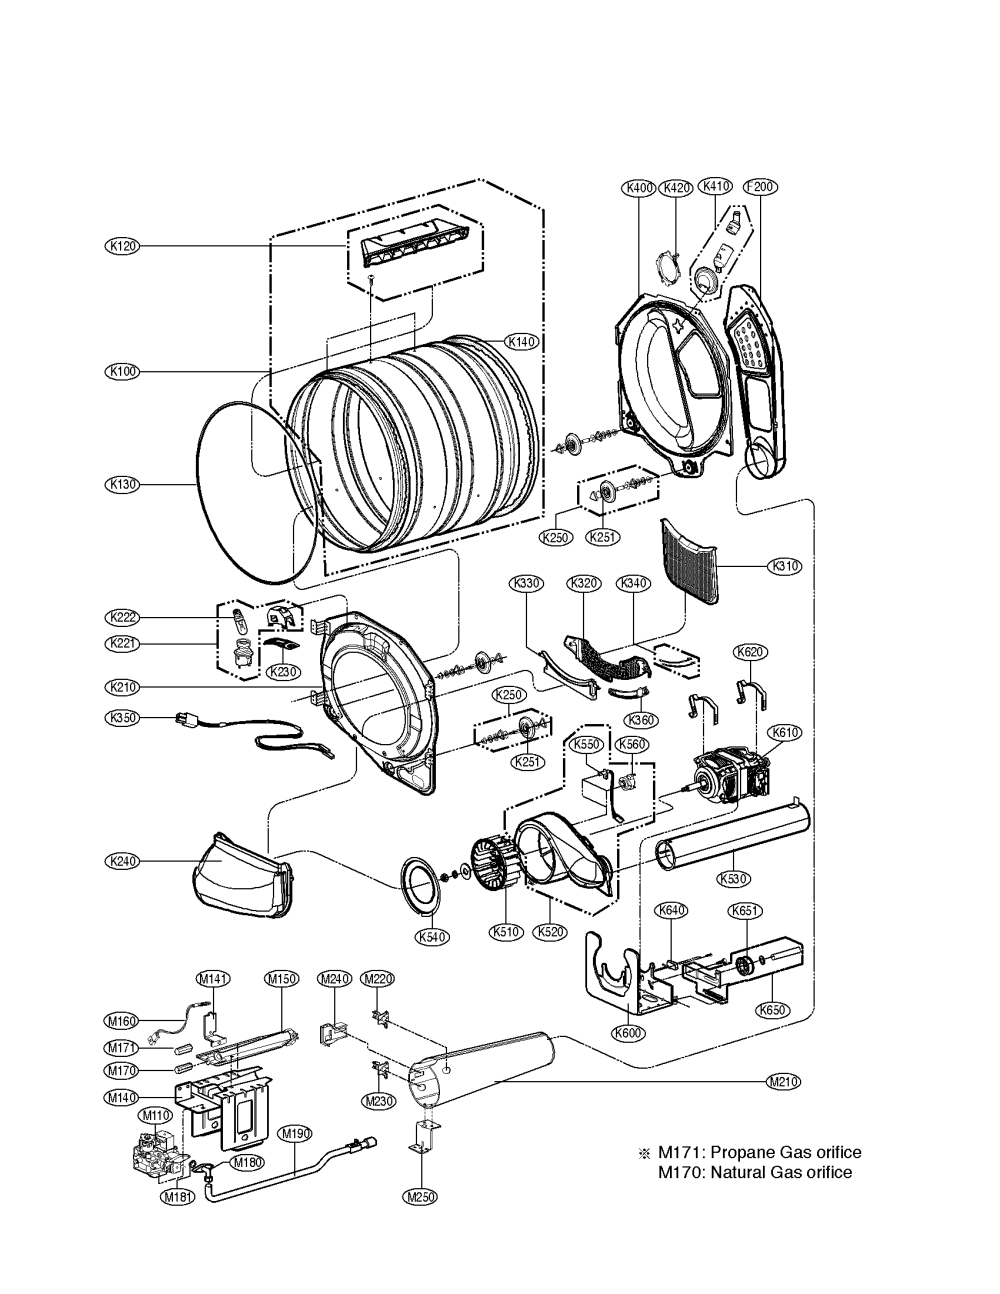 medium resolution of kenmore elite dryer parts model 79691029900 sears partsdirect whirlpool gas dryer electrical schematic sears dryer schematic